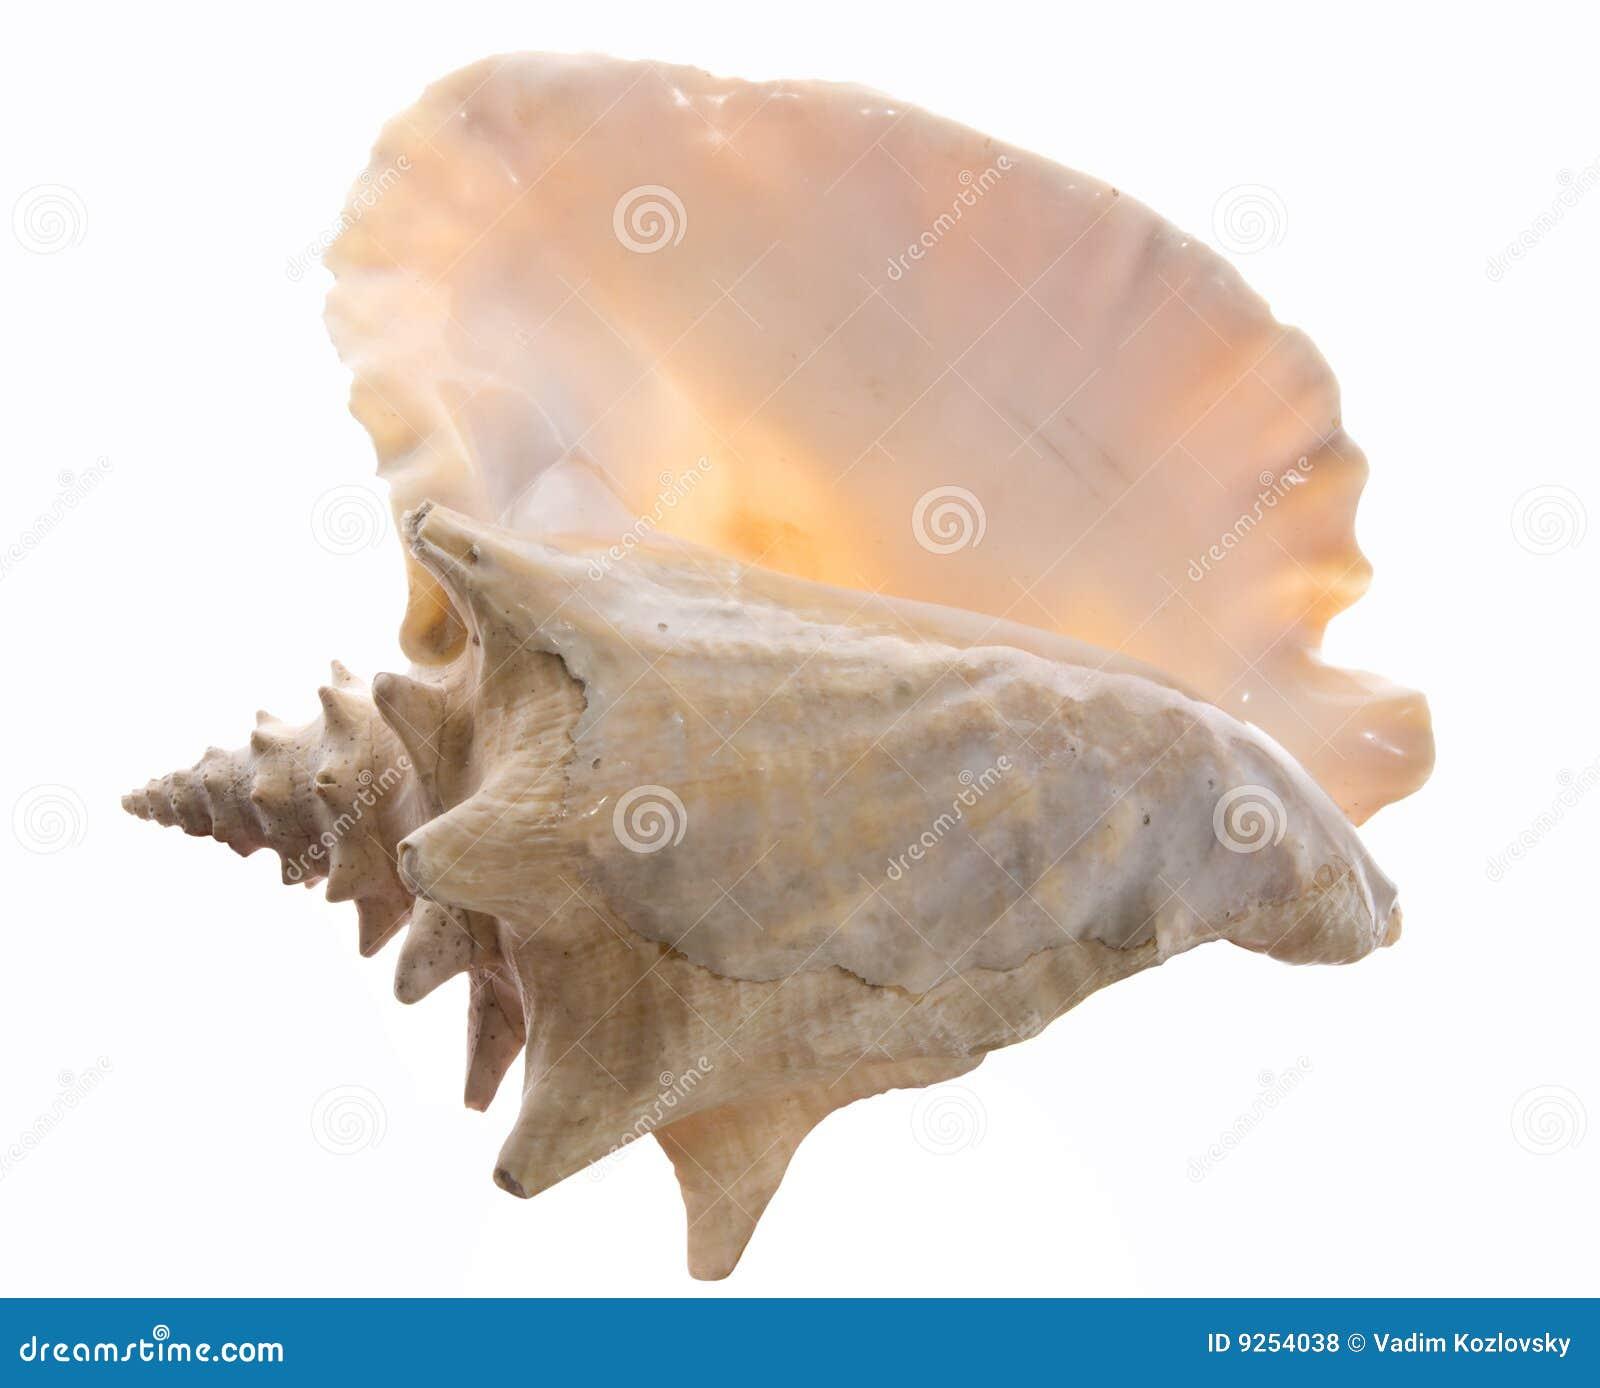 Big Sea Shell Royalty Free Stock Photos Image 9254038